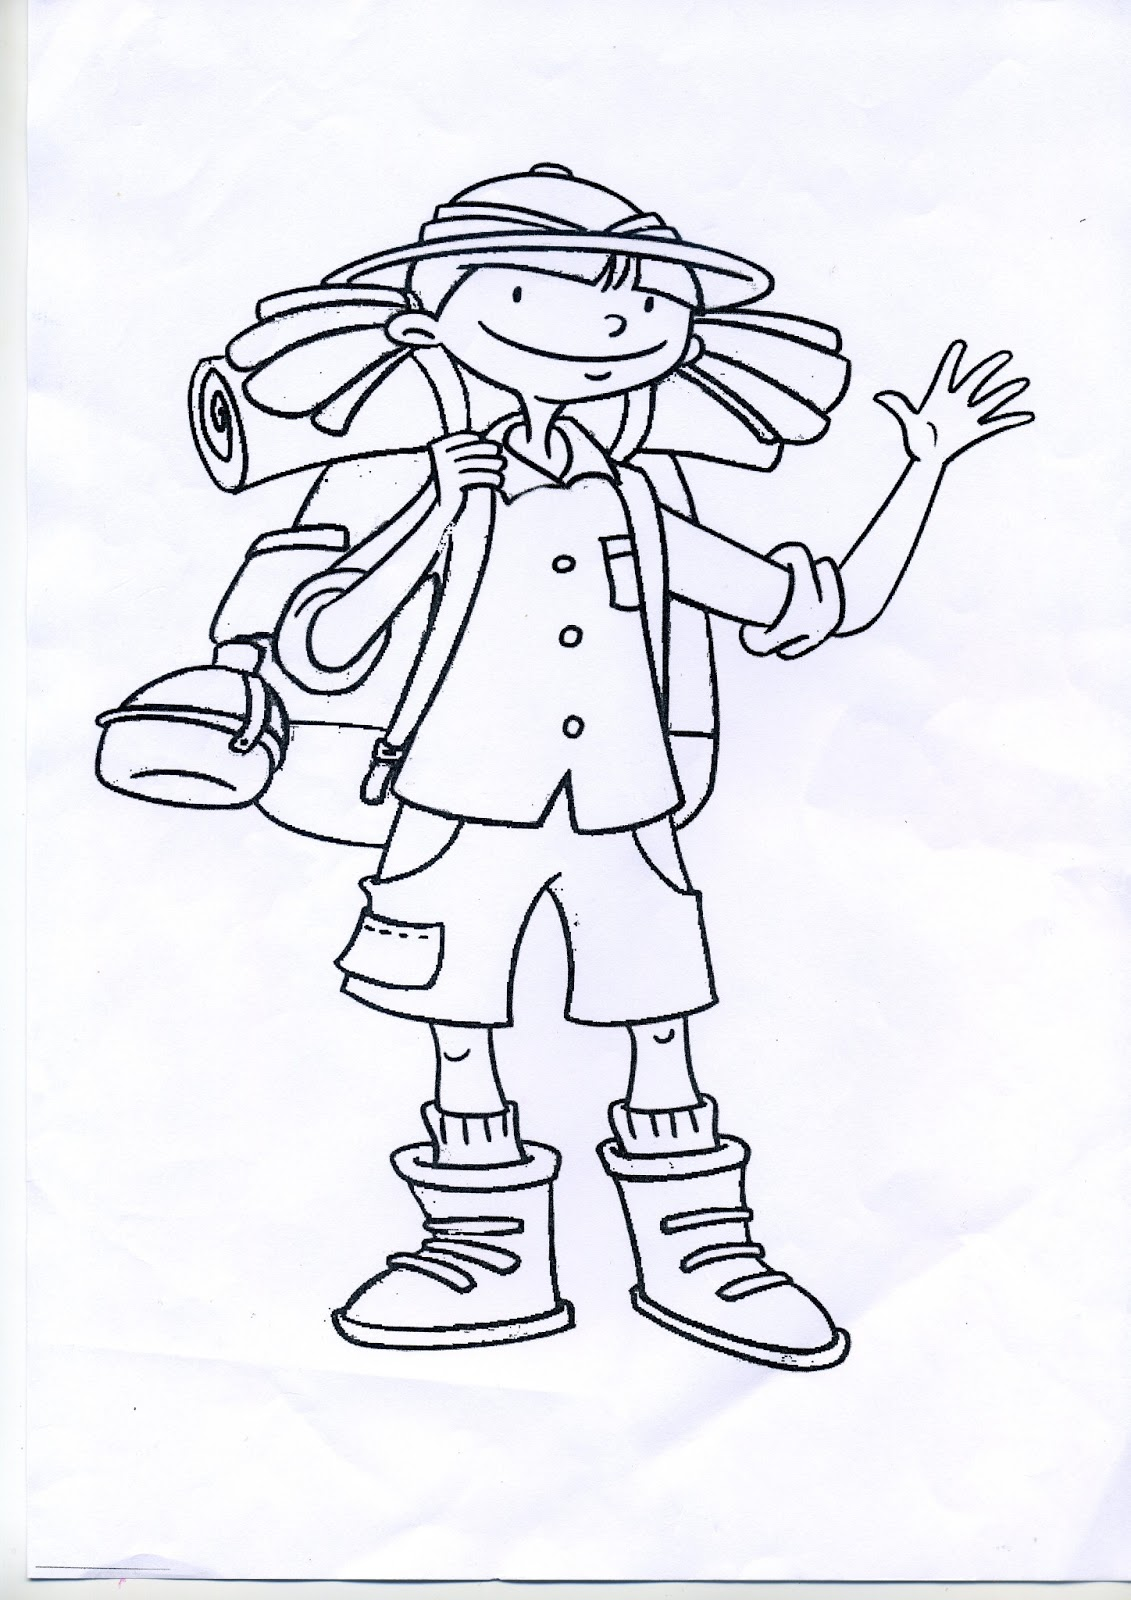 Dibujos del comedor escolar para colorear imagui for Comedor para dibujar